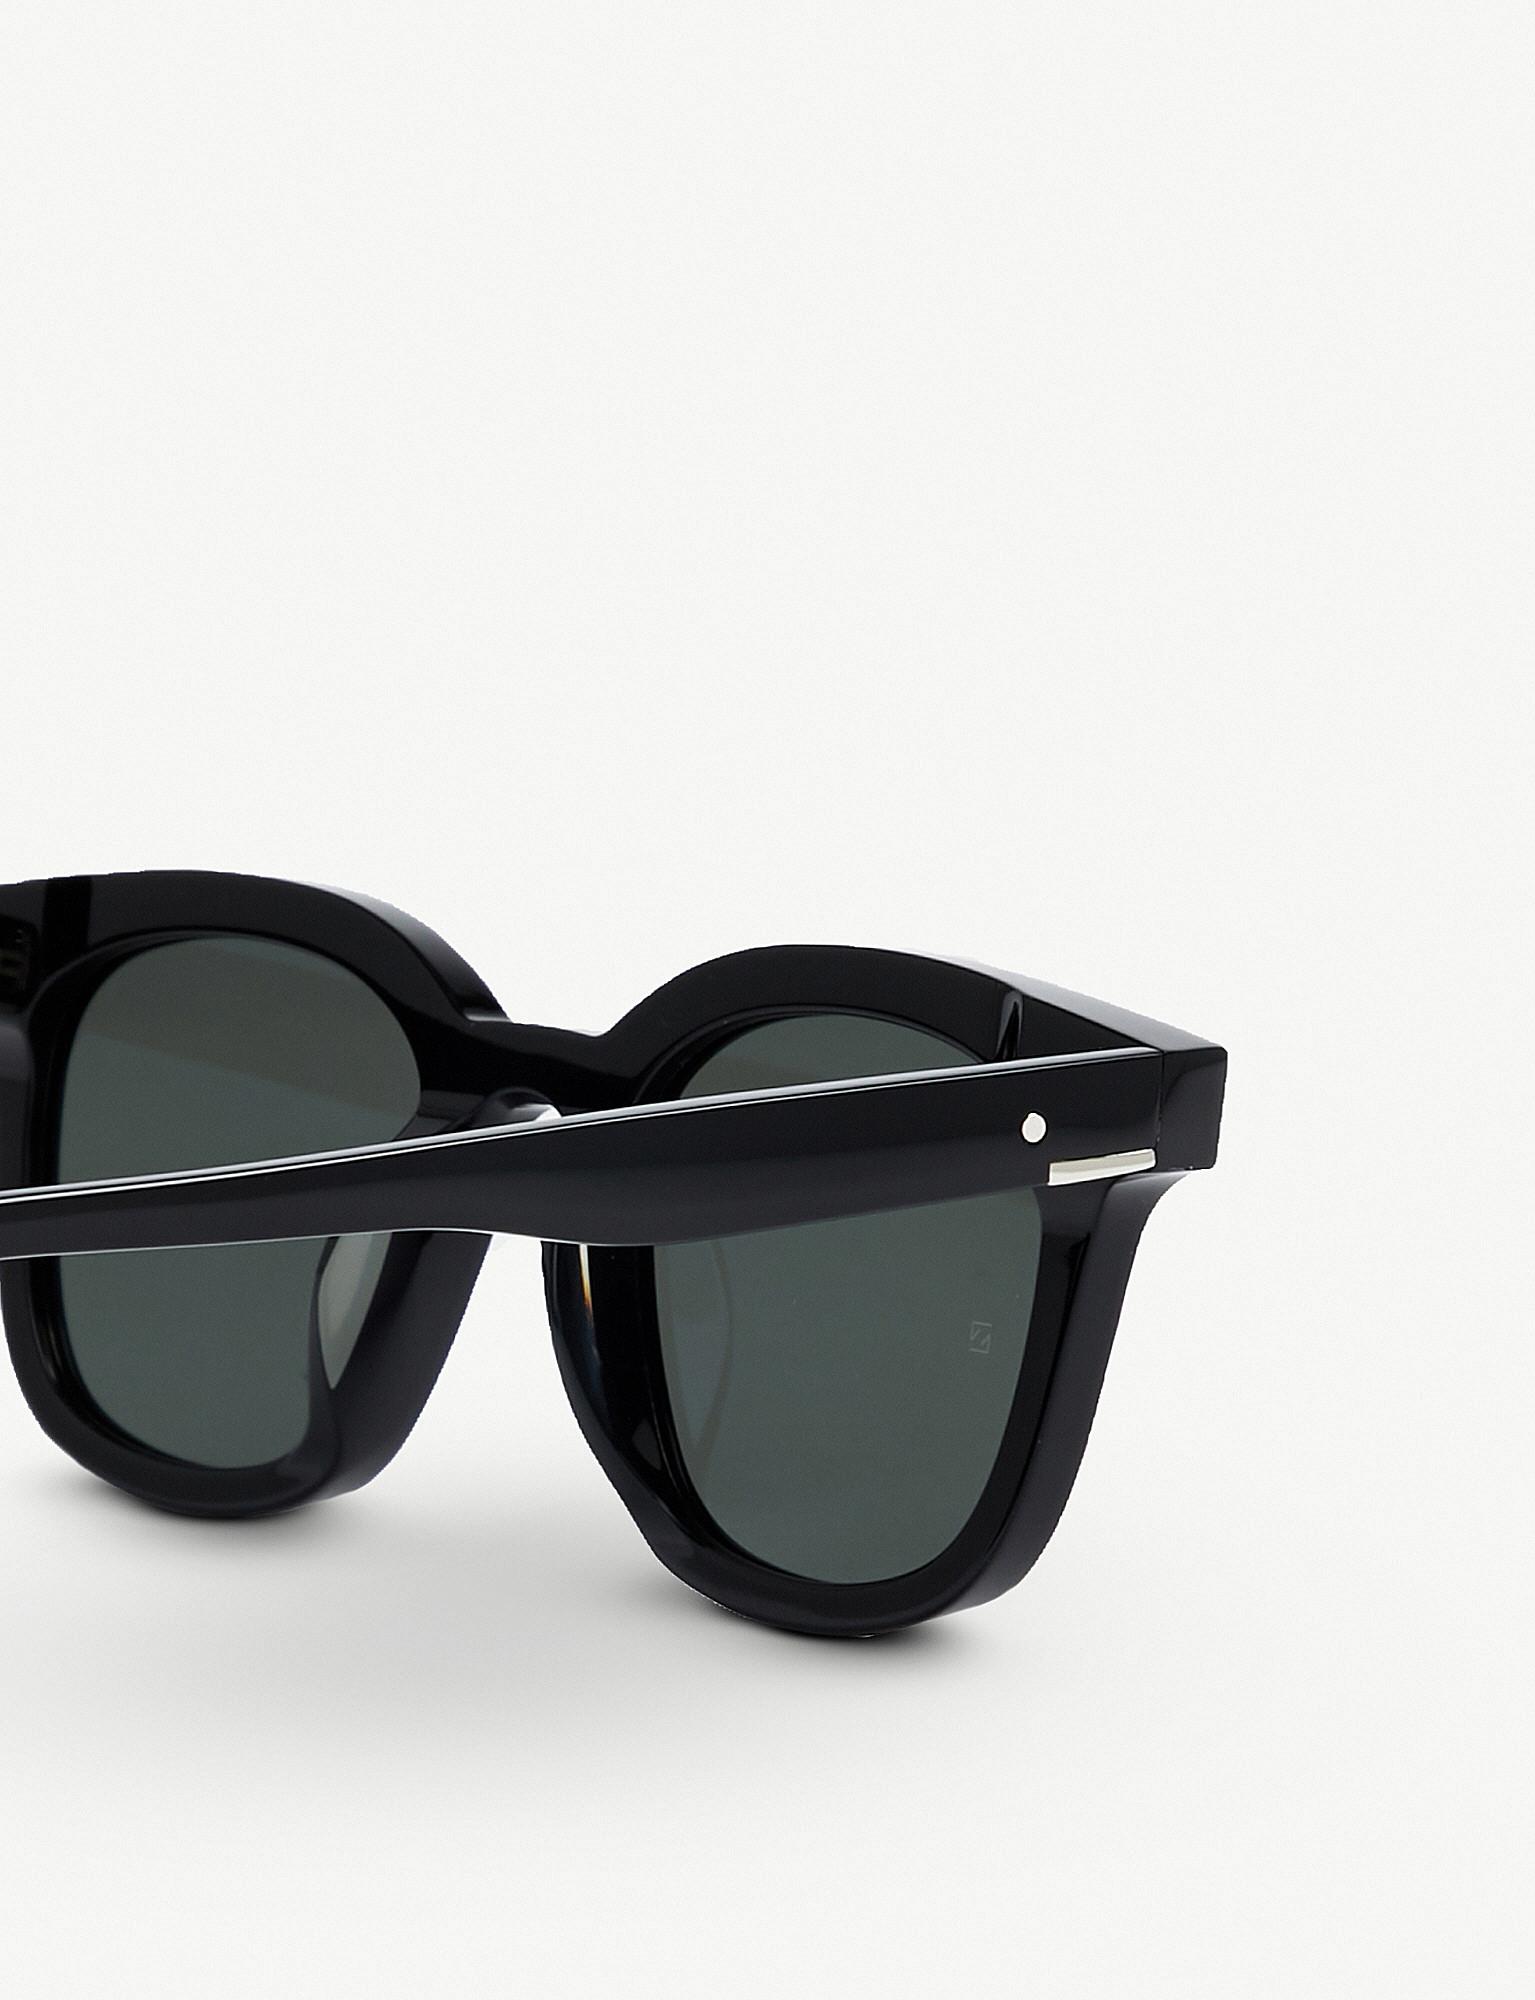 0629c8a335 GENTLE MONSTER - Dal Lake acetate sunglasses